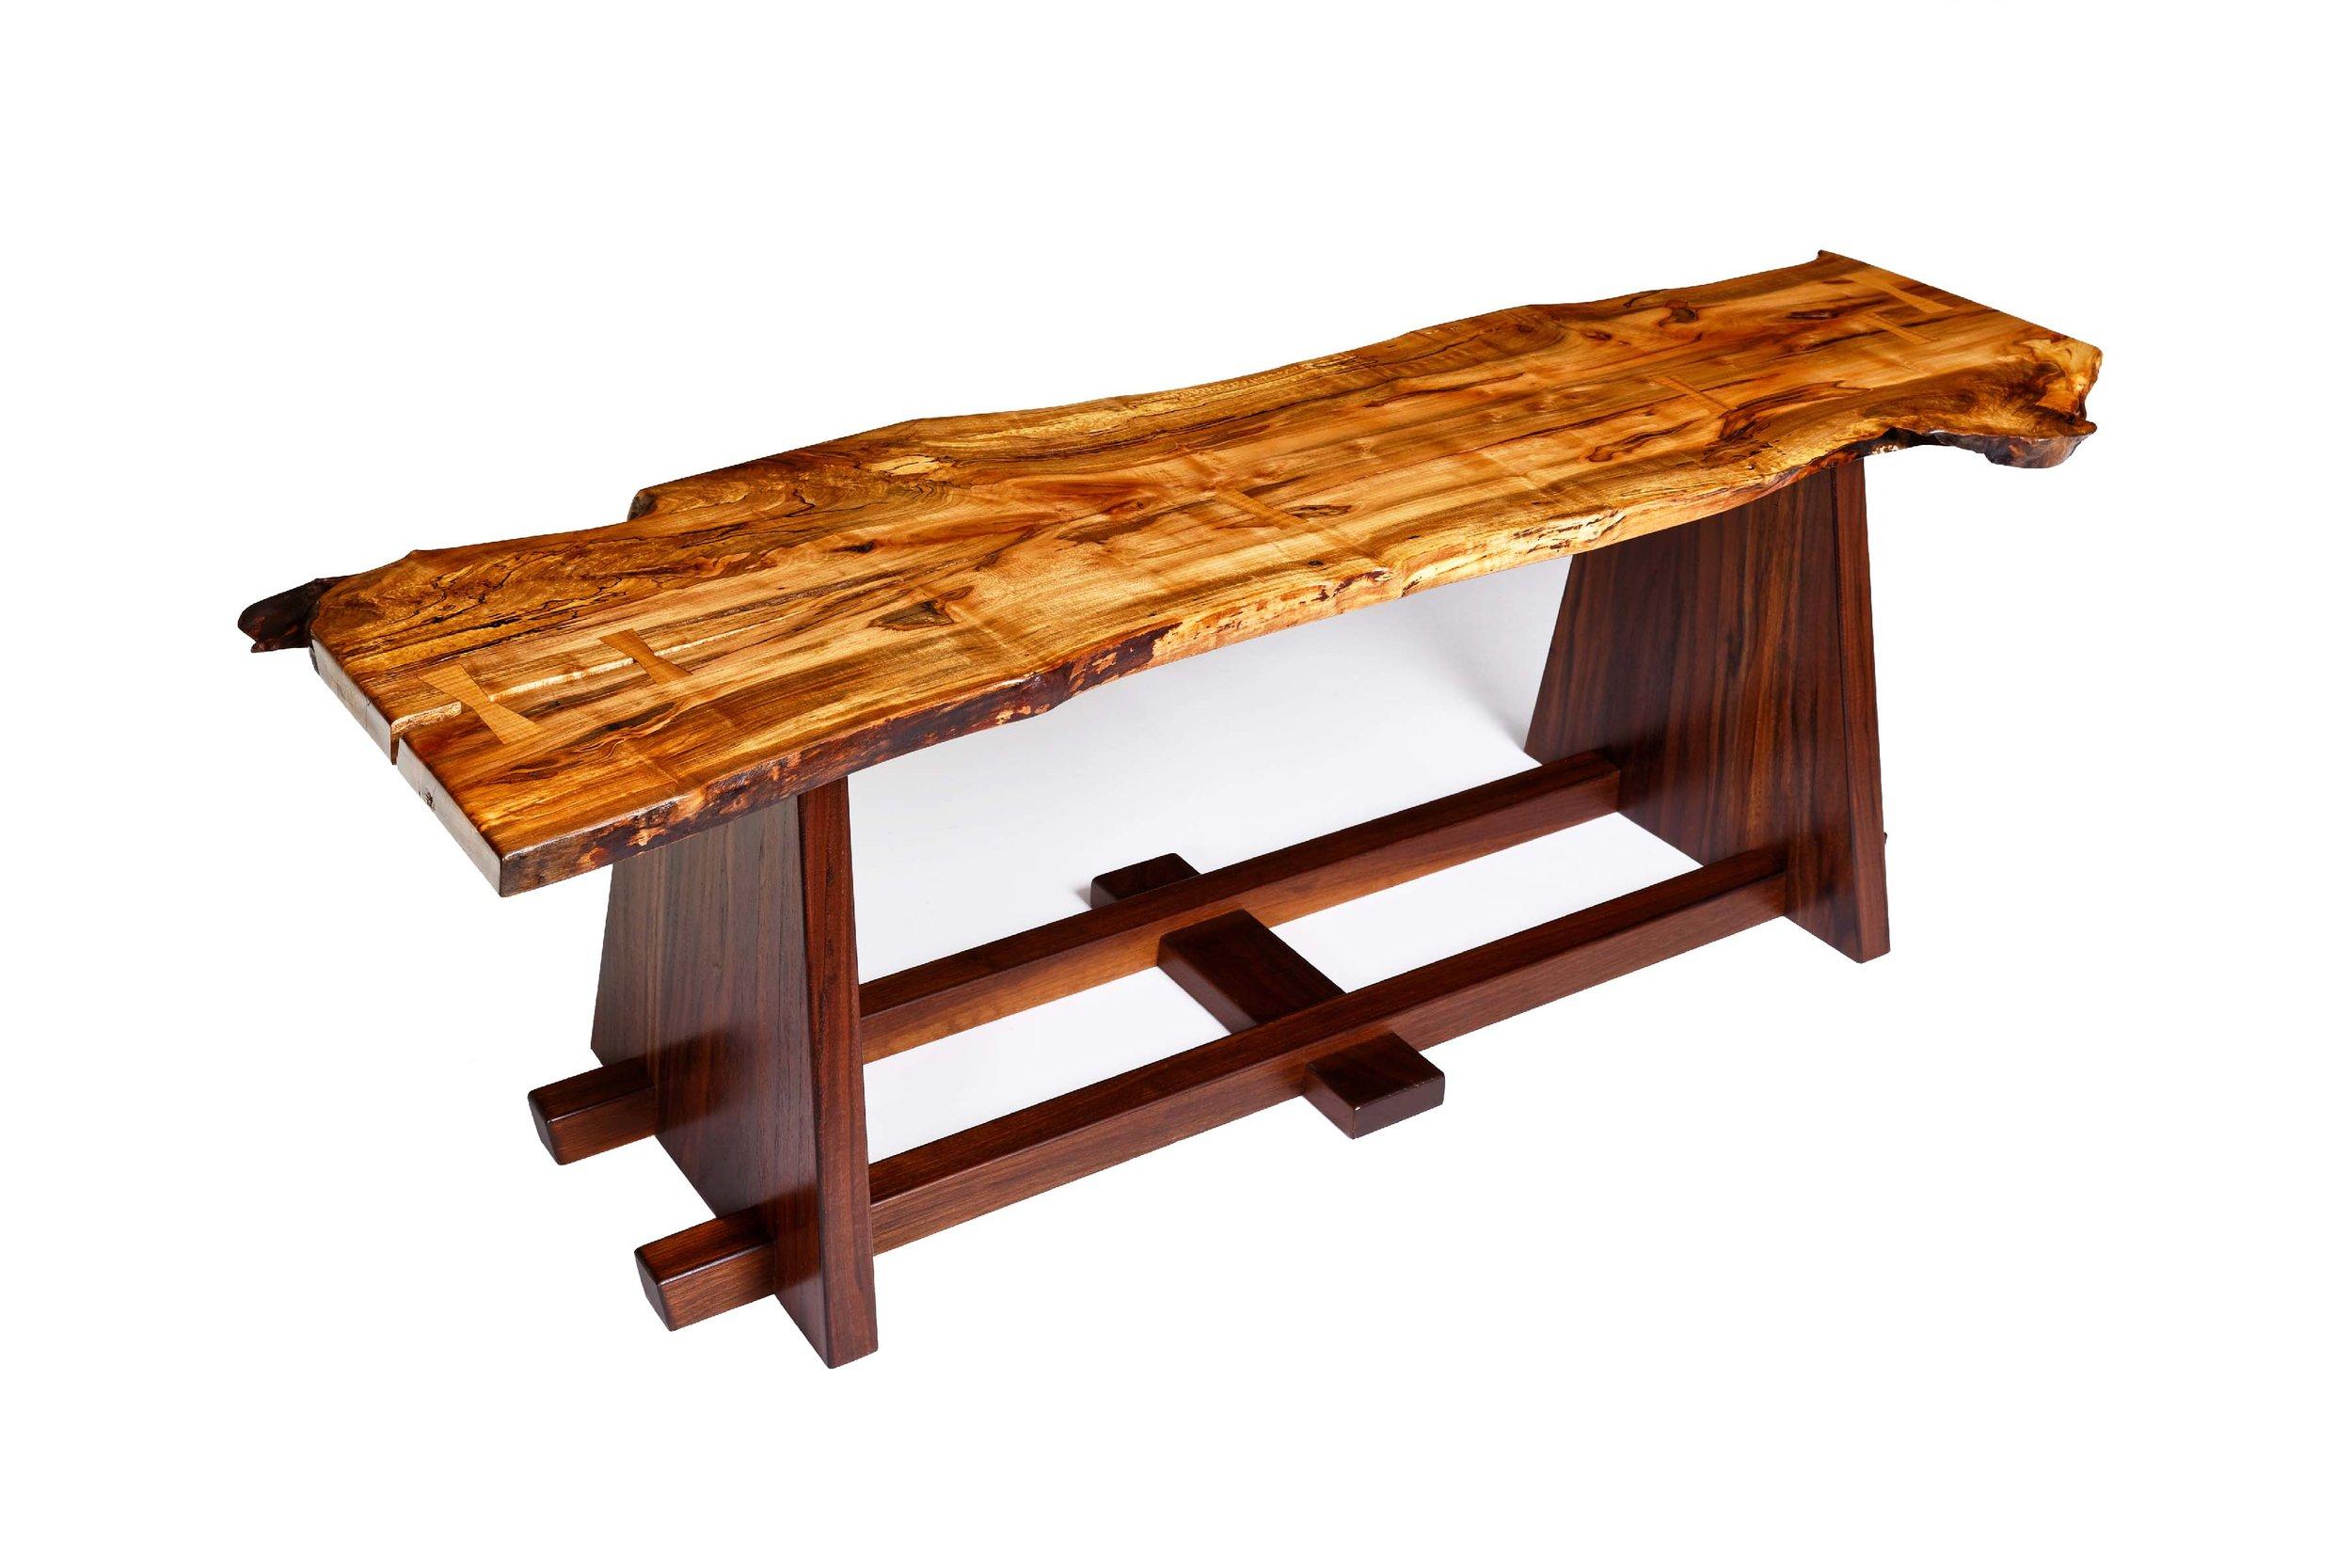 Ghost Maple Table-1sml copy.jpg